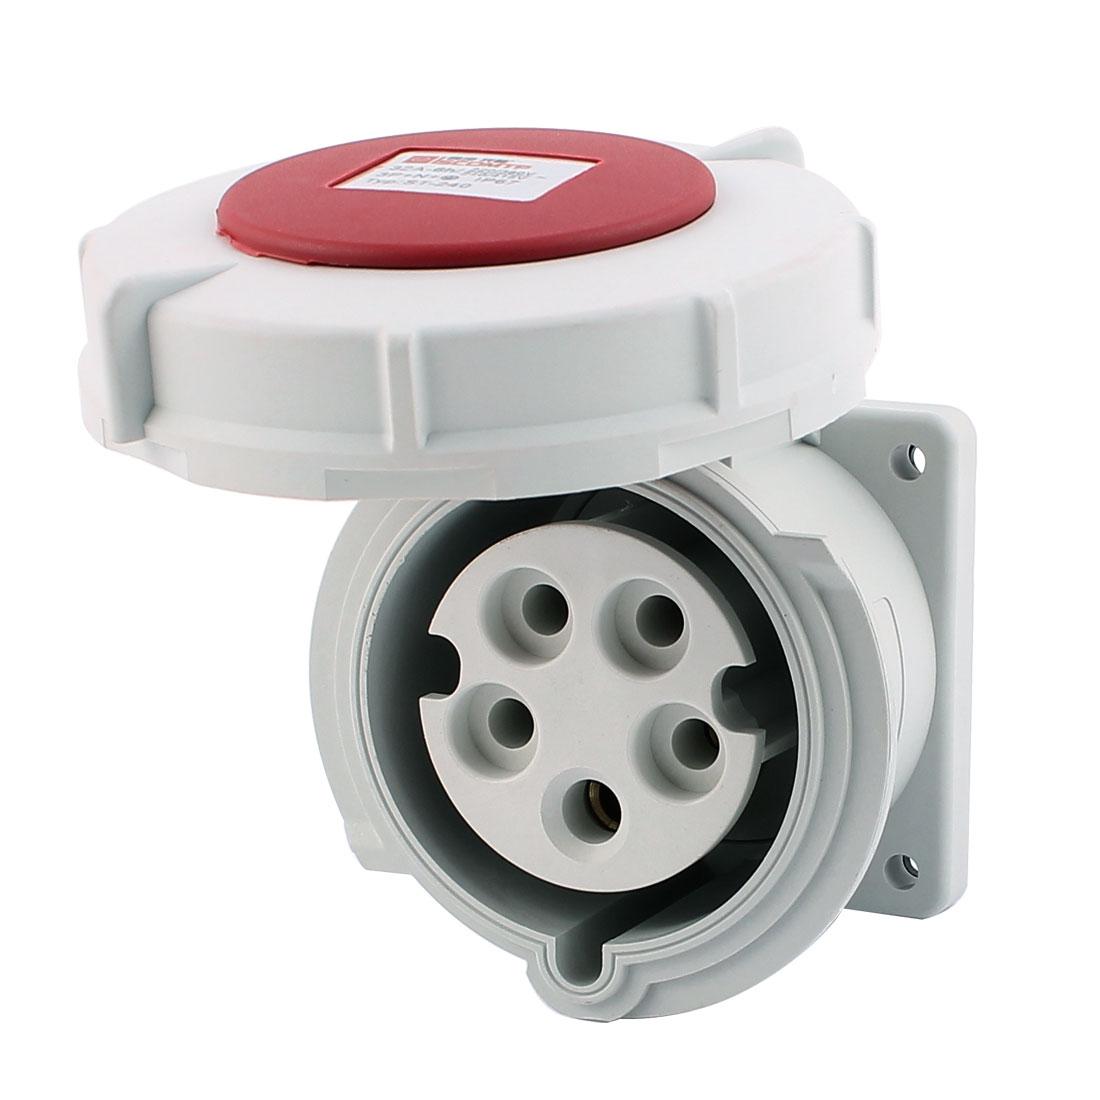 AC 240V-415V 32A IP67 3P+N+E 5-Terminal Female Industrial Straight Socket